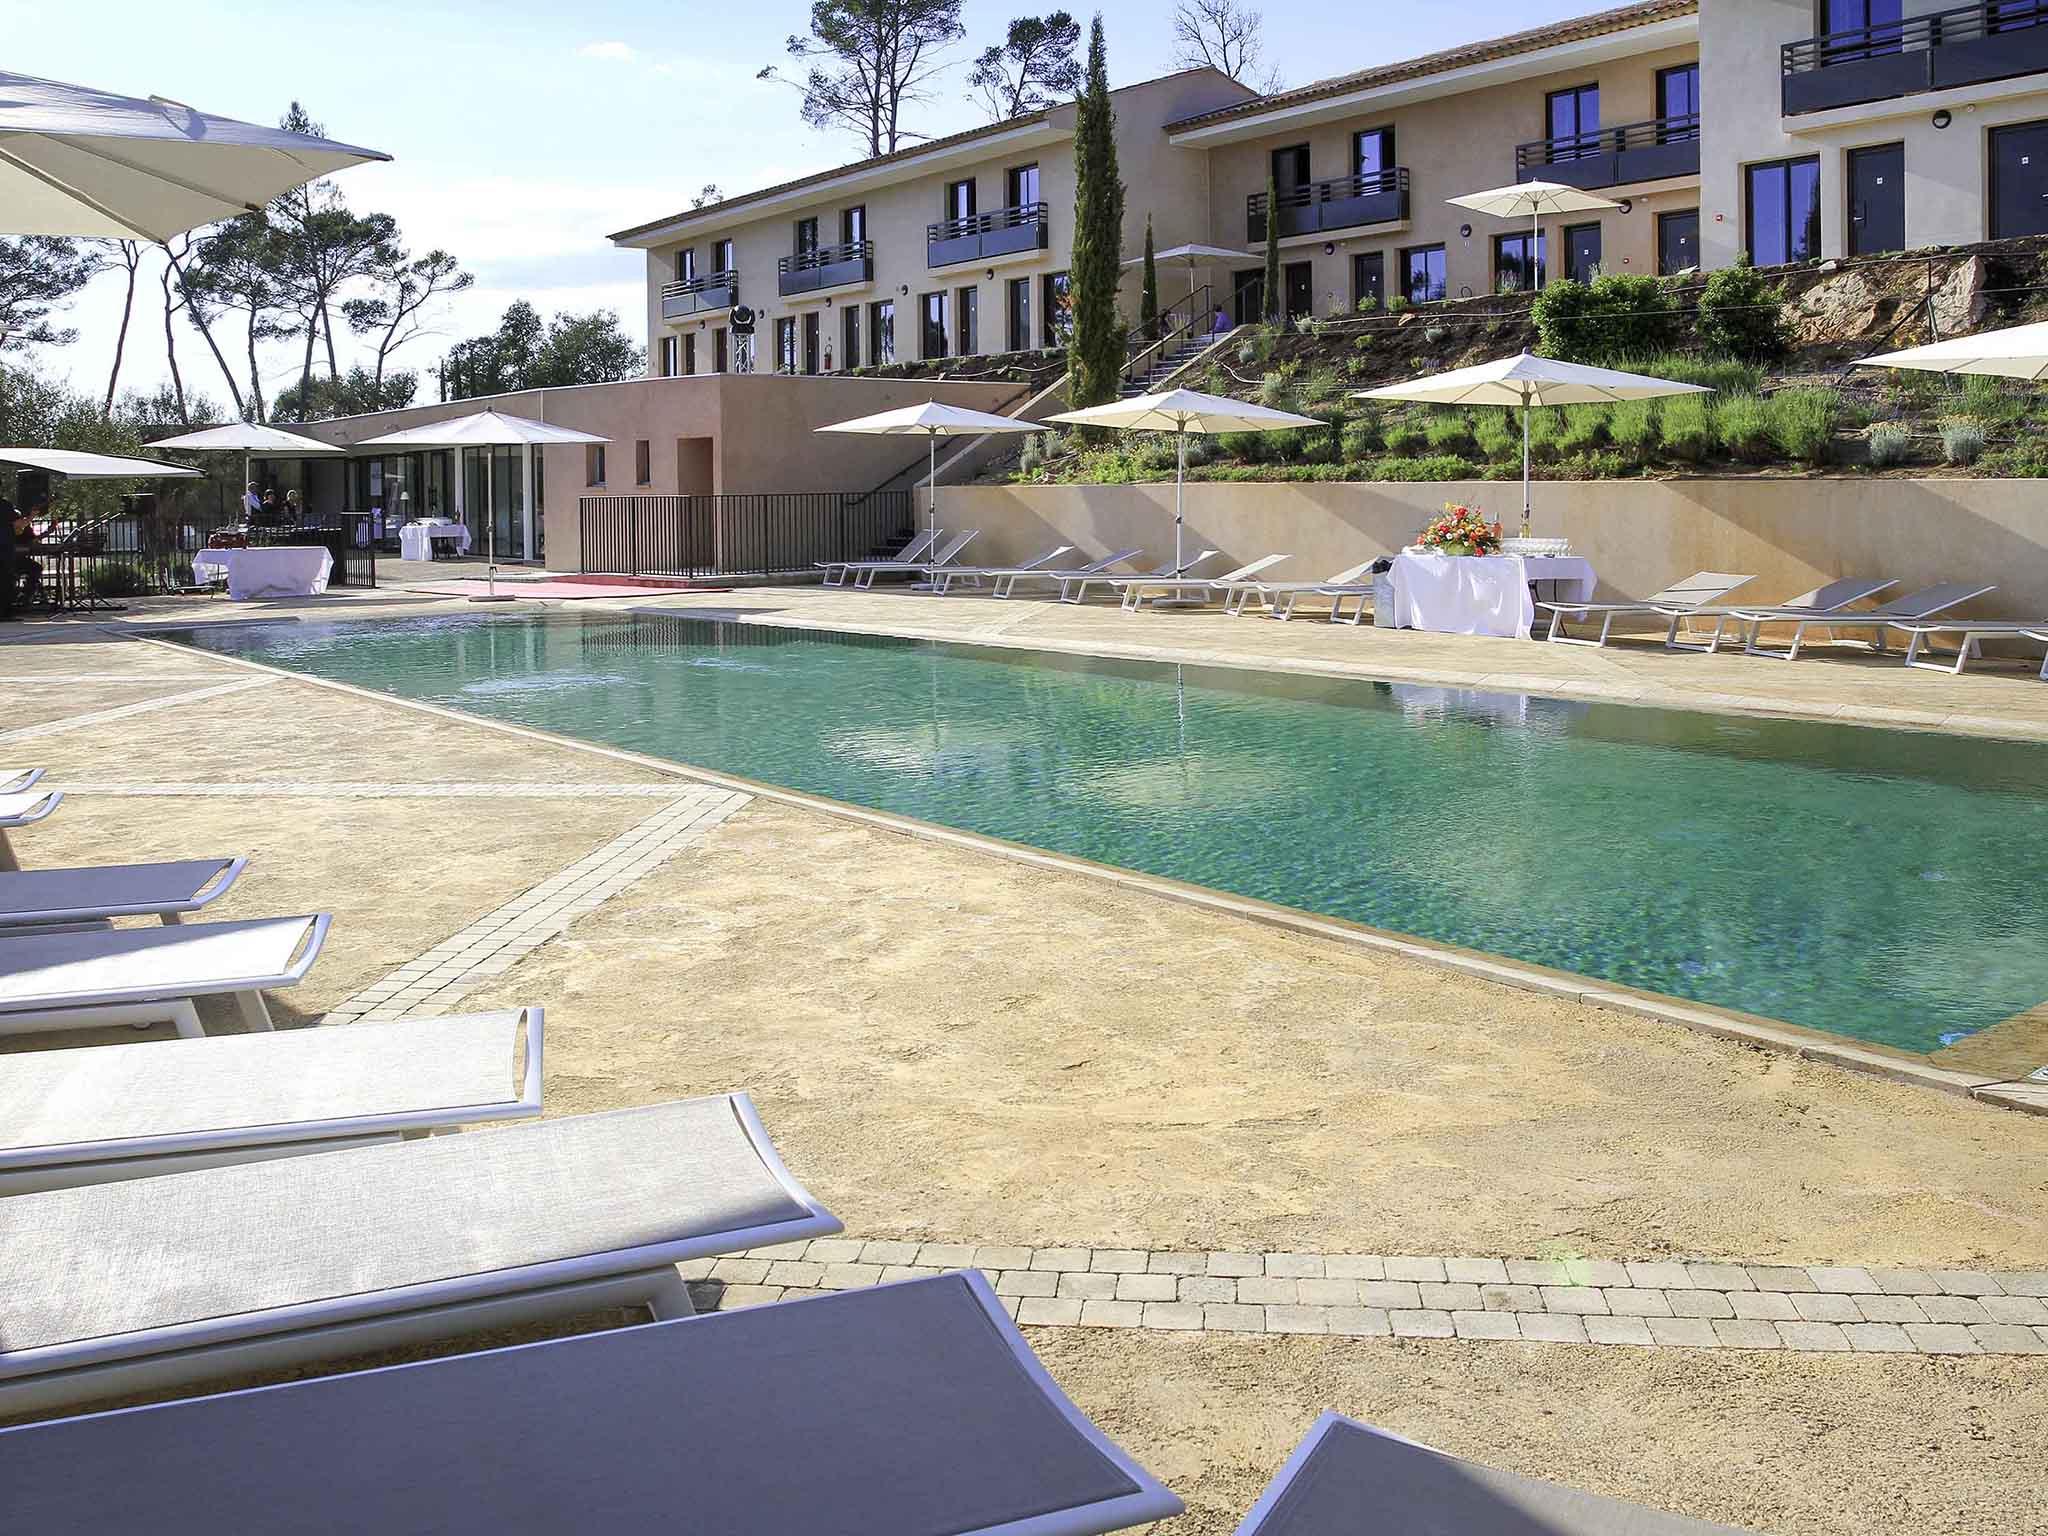 Hôtel - Hôtel Mercure Brignoles Golf de Barbaroux